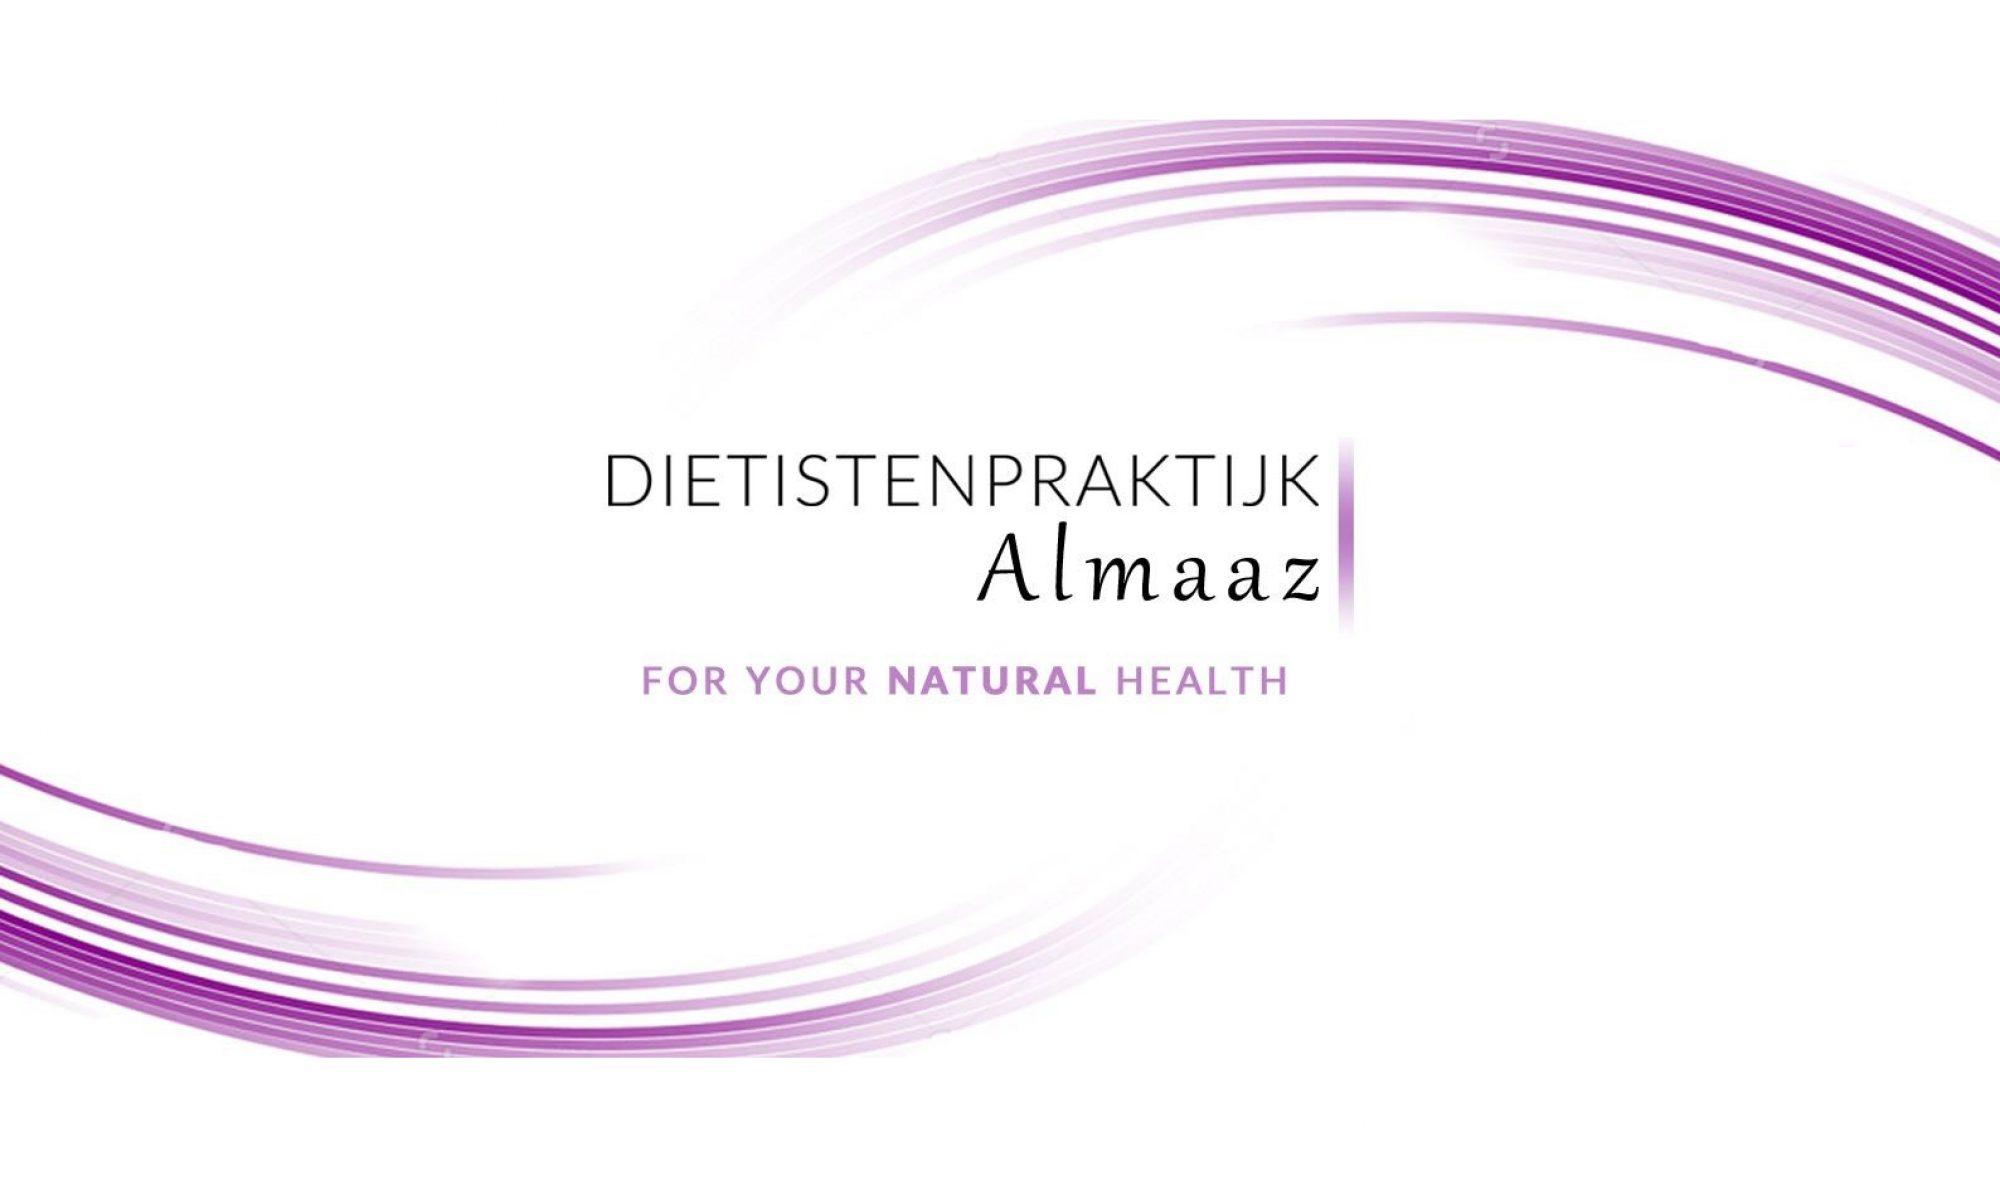 Dietistenpraktijk Almaaz